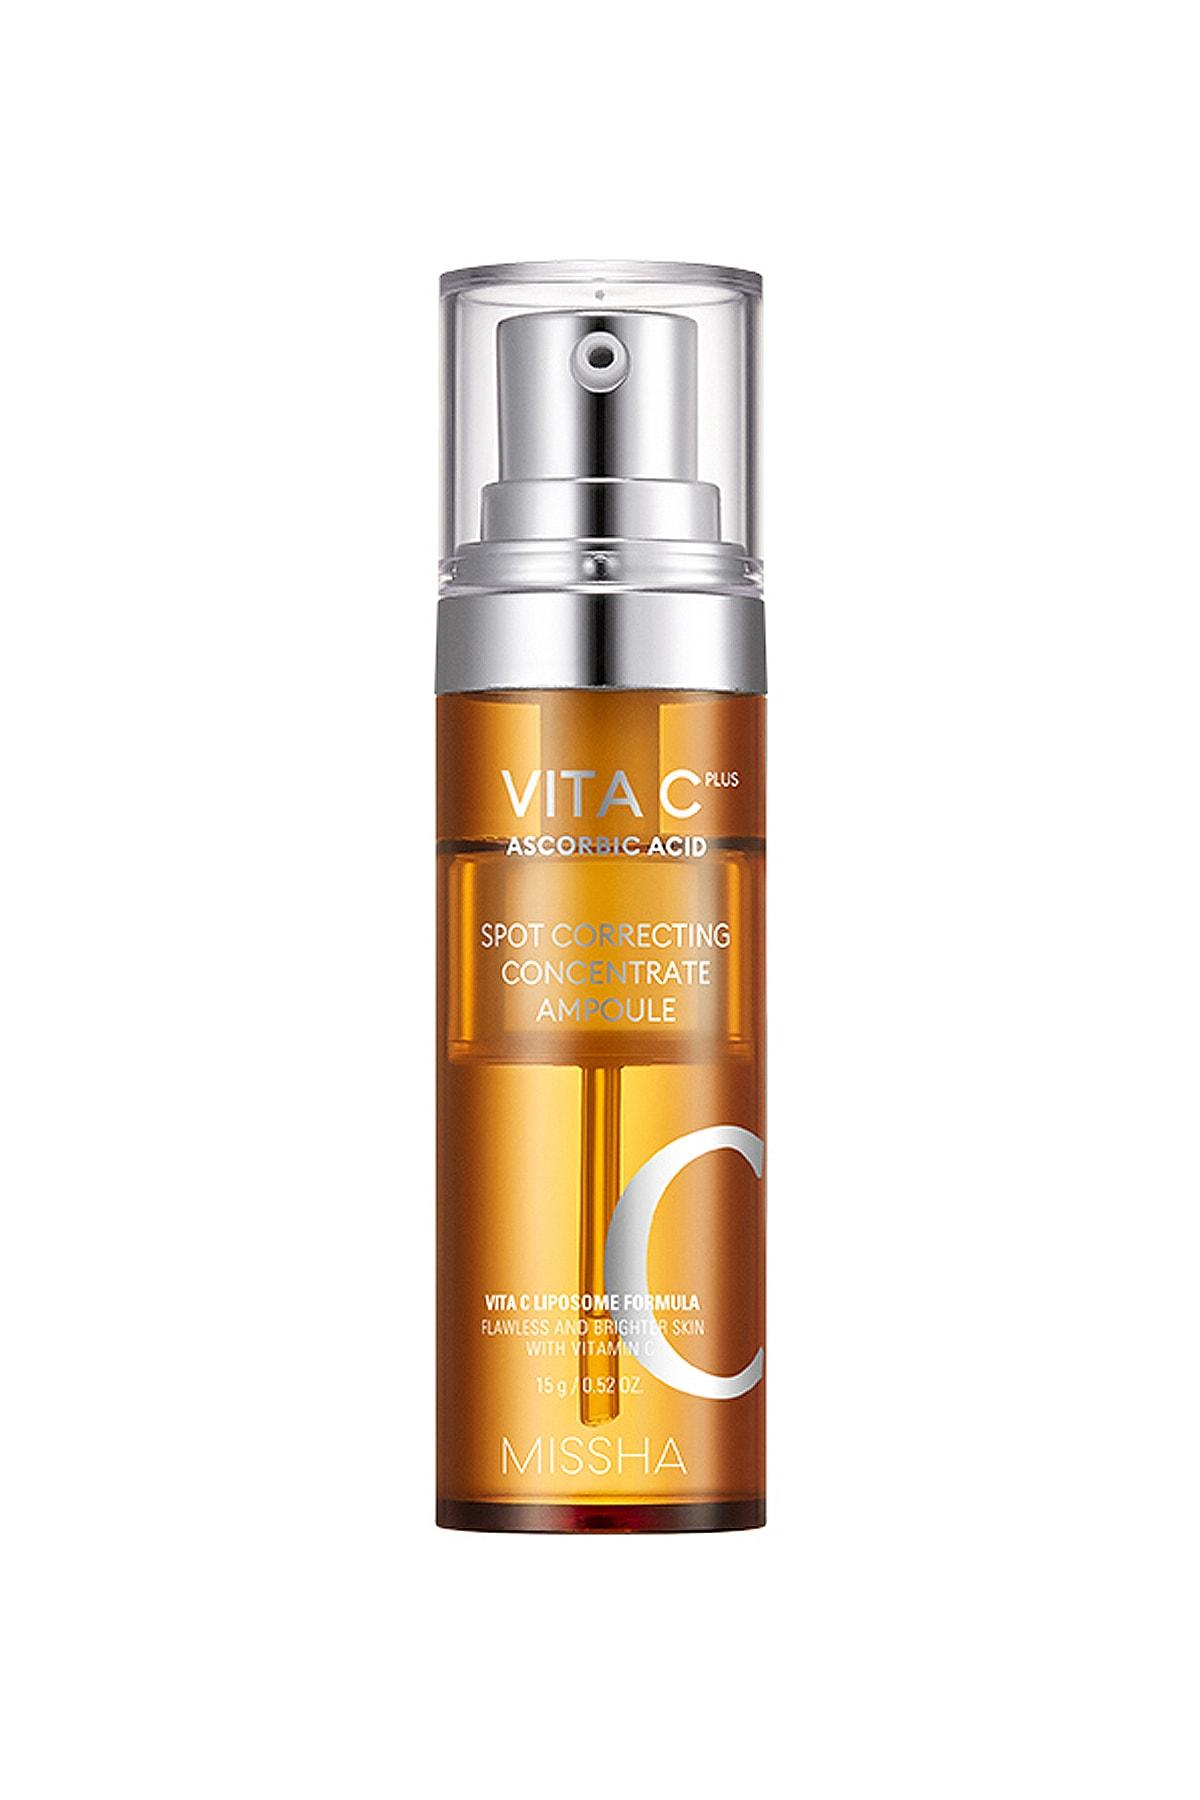 Missha Leke Karşıtı Konsantre C Vitamini Serumu 15g Vita C Plus Correcting Concentrate Ampoule